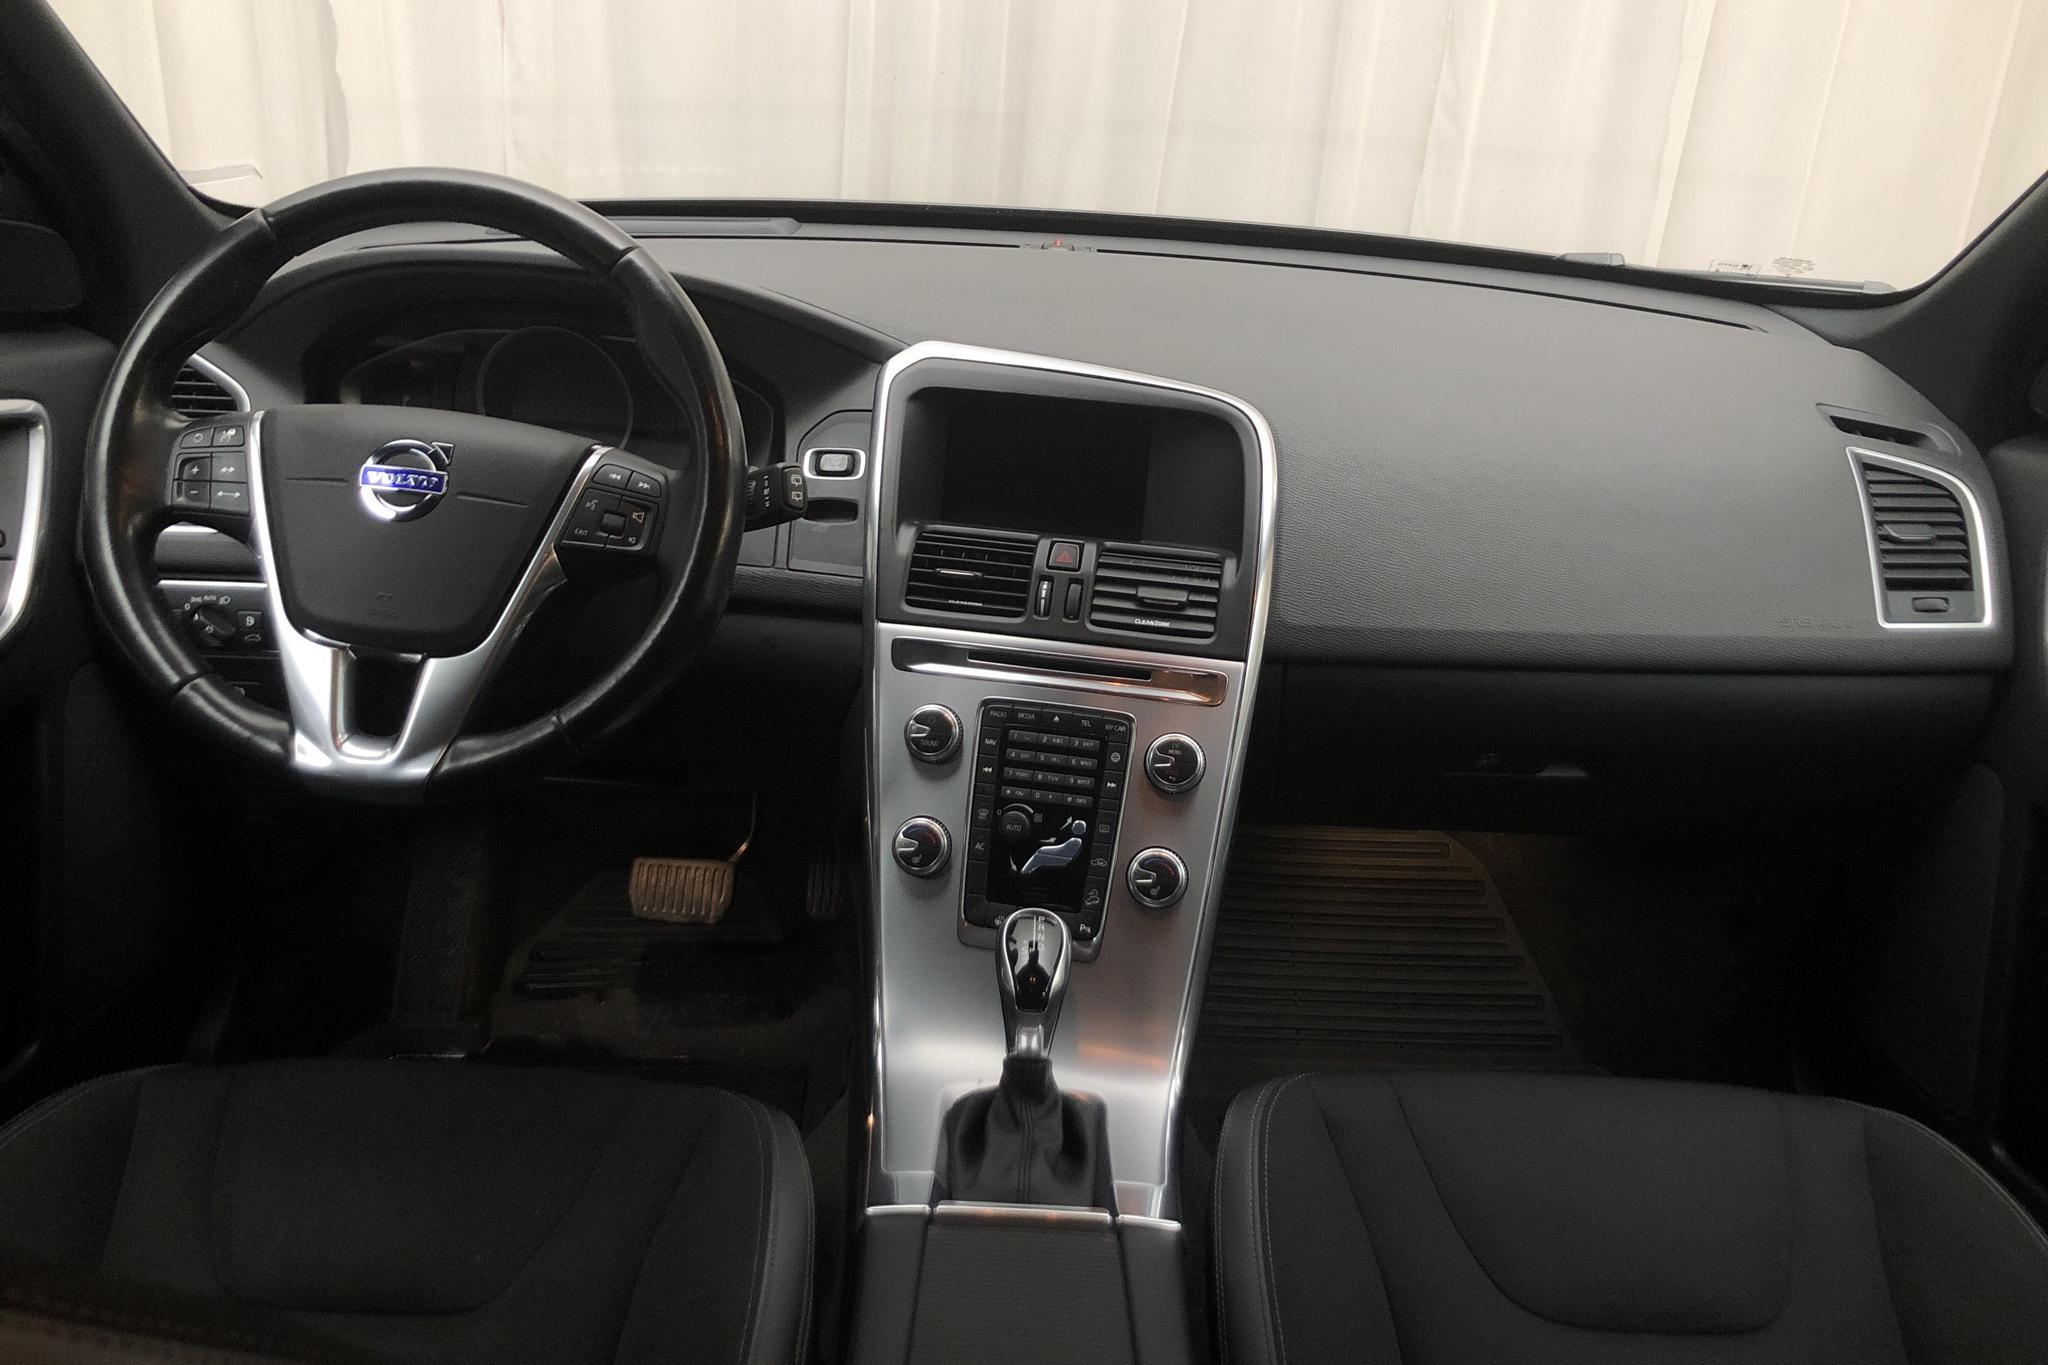 Volvo XC60 D4 AWD (190hk) - 173 910 km - Automatic - black - 2017